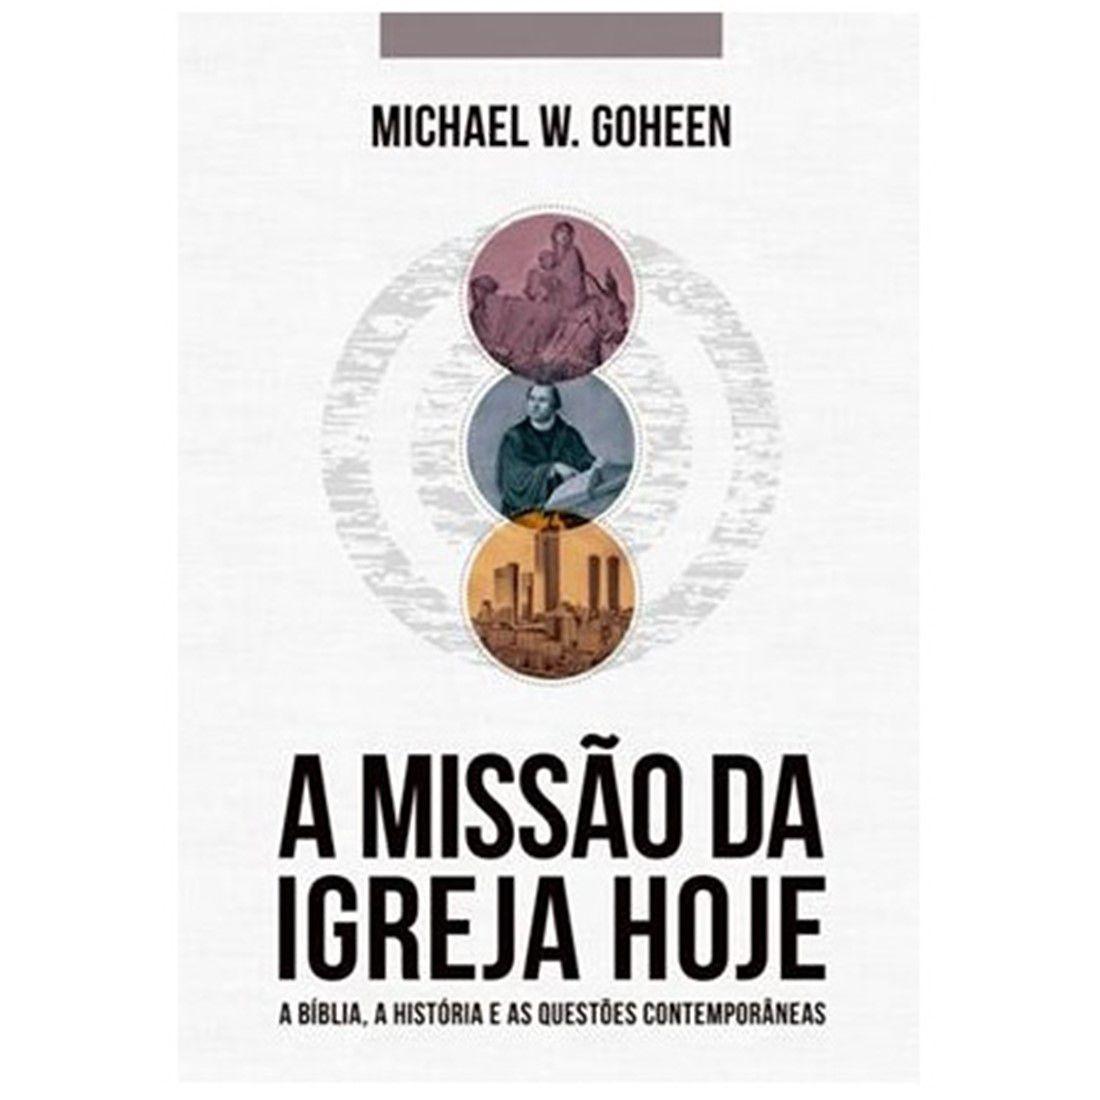 Livro A Missão da Igreja Hoje